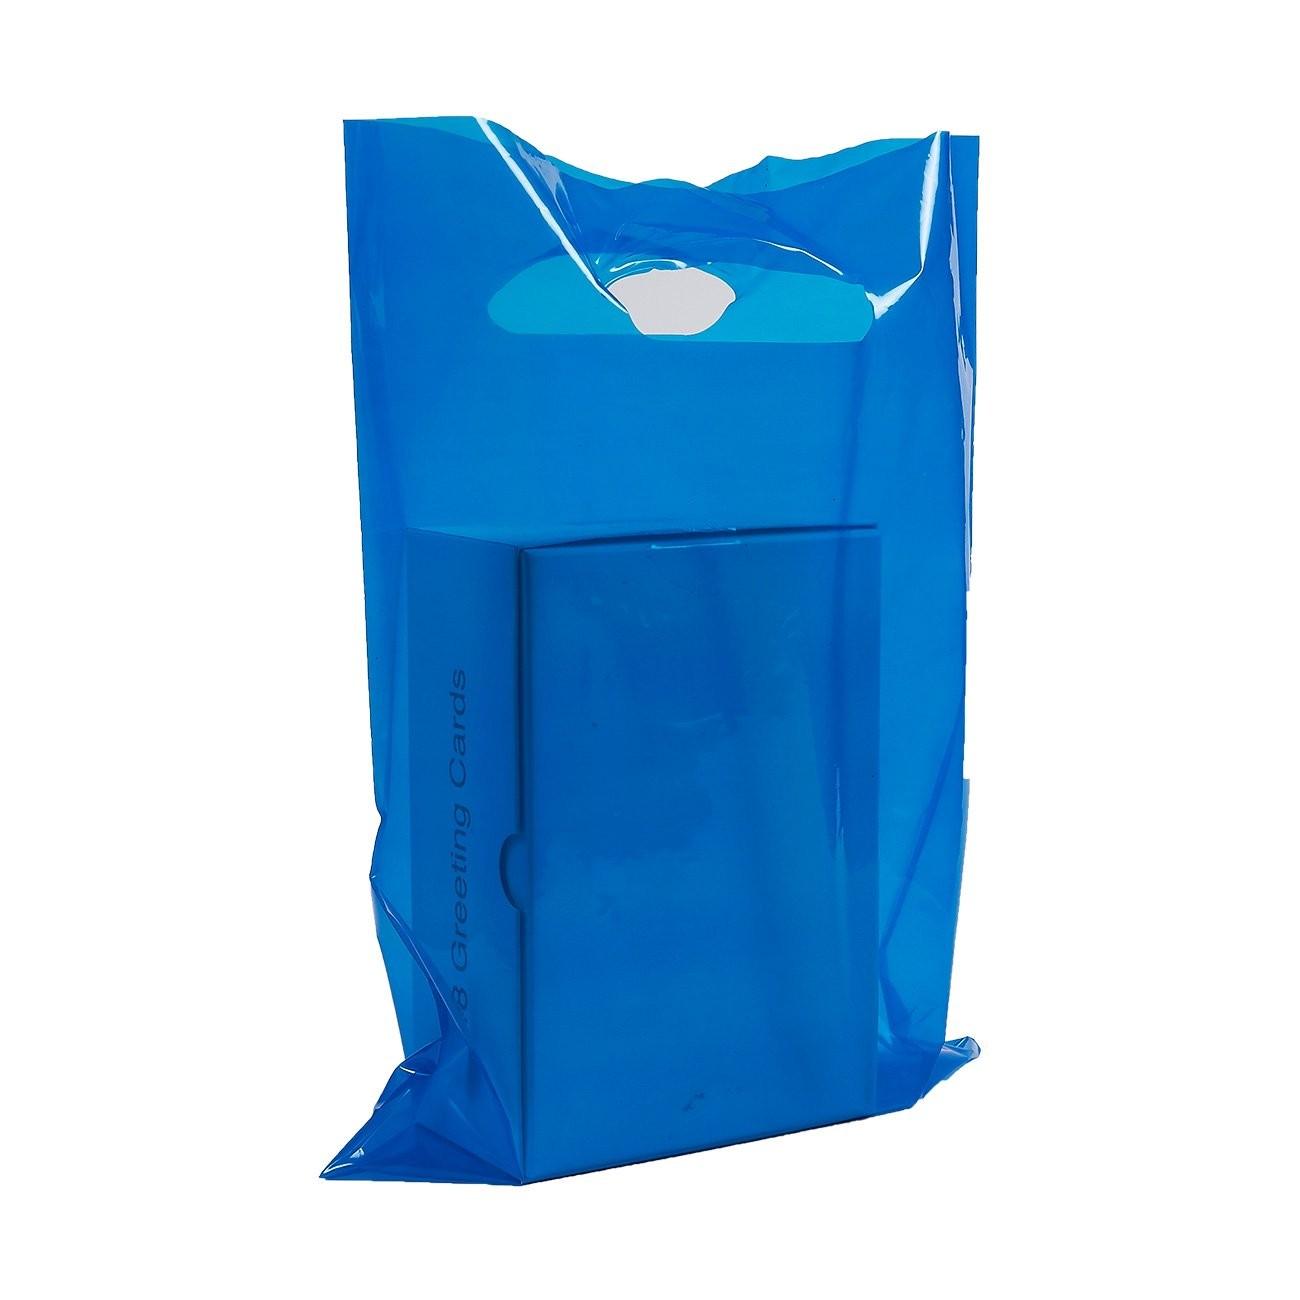 "Glossy Blue Reusable Flat Die Cut Handle Bags 40 cm x 50 cm (15.5"" x 19.5"") (300 Bags/Lot)"